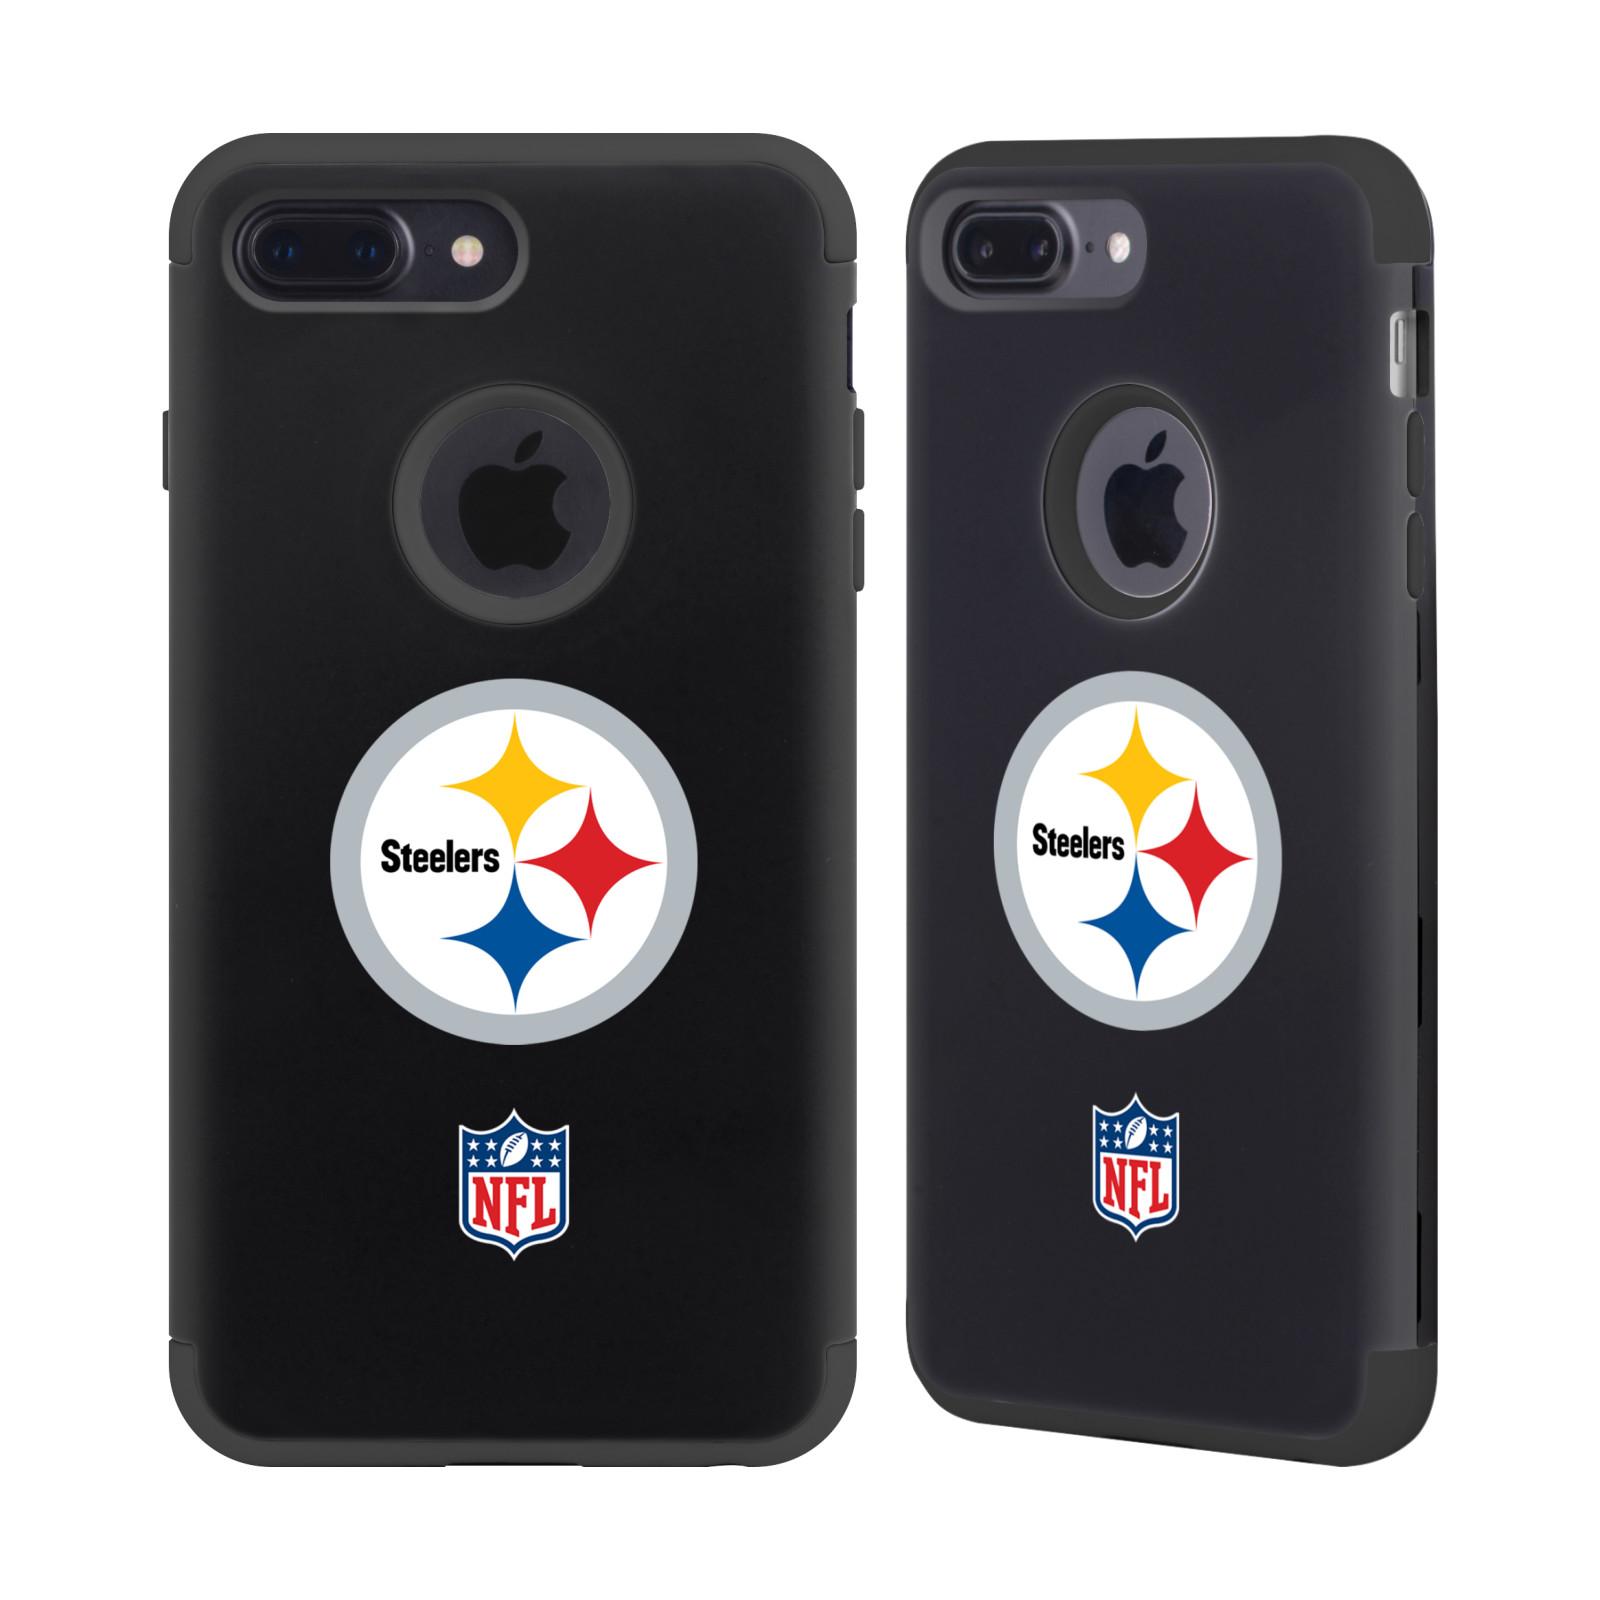 NFL-PITTSBURGH-STEELERS-LOGO-2-BLACK-GUARDIAN-CASE-FOR-APPLE-iPHONE-PHONES